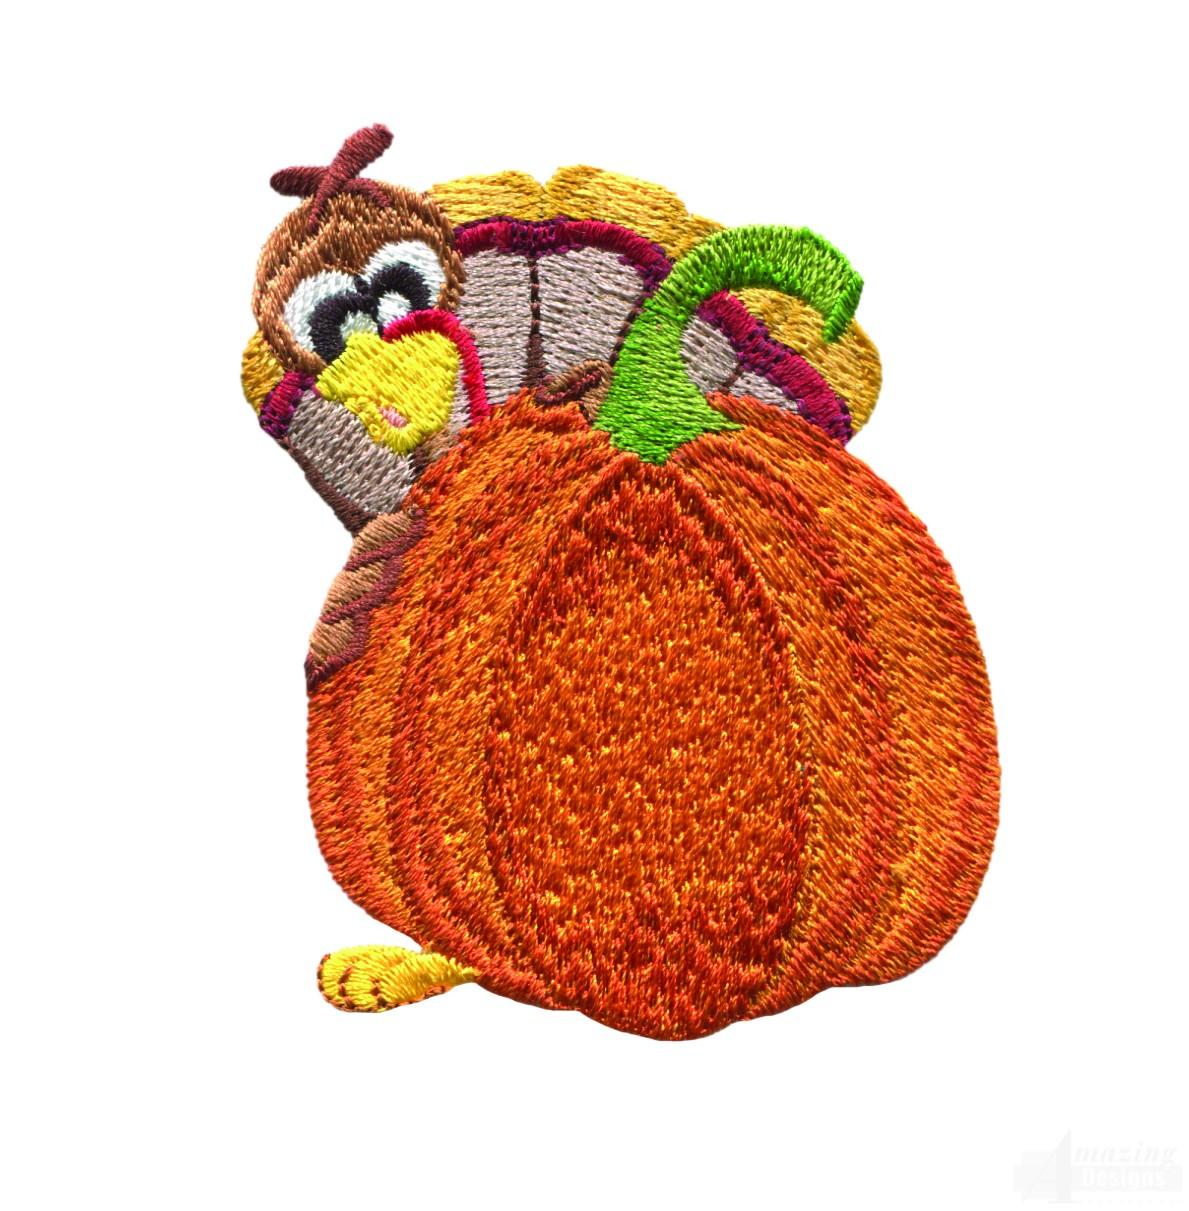 Embroidery Design Turkey Applique Design Monogram